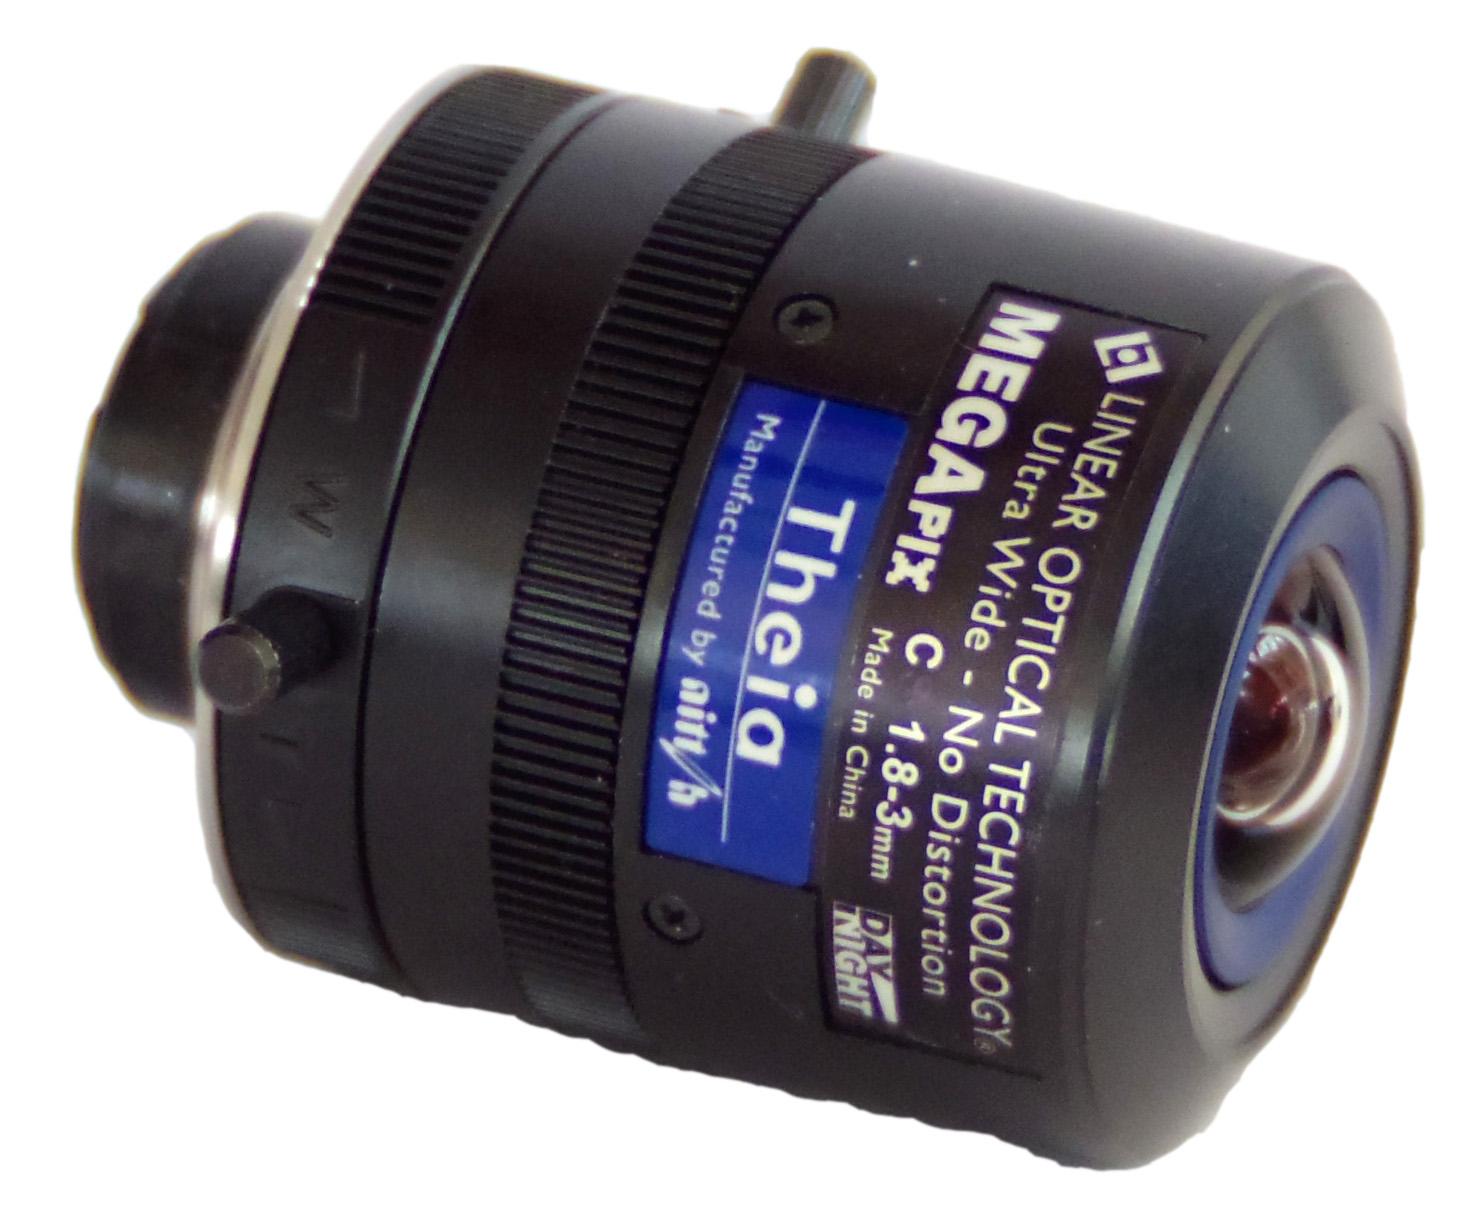 Theia ML183M lens